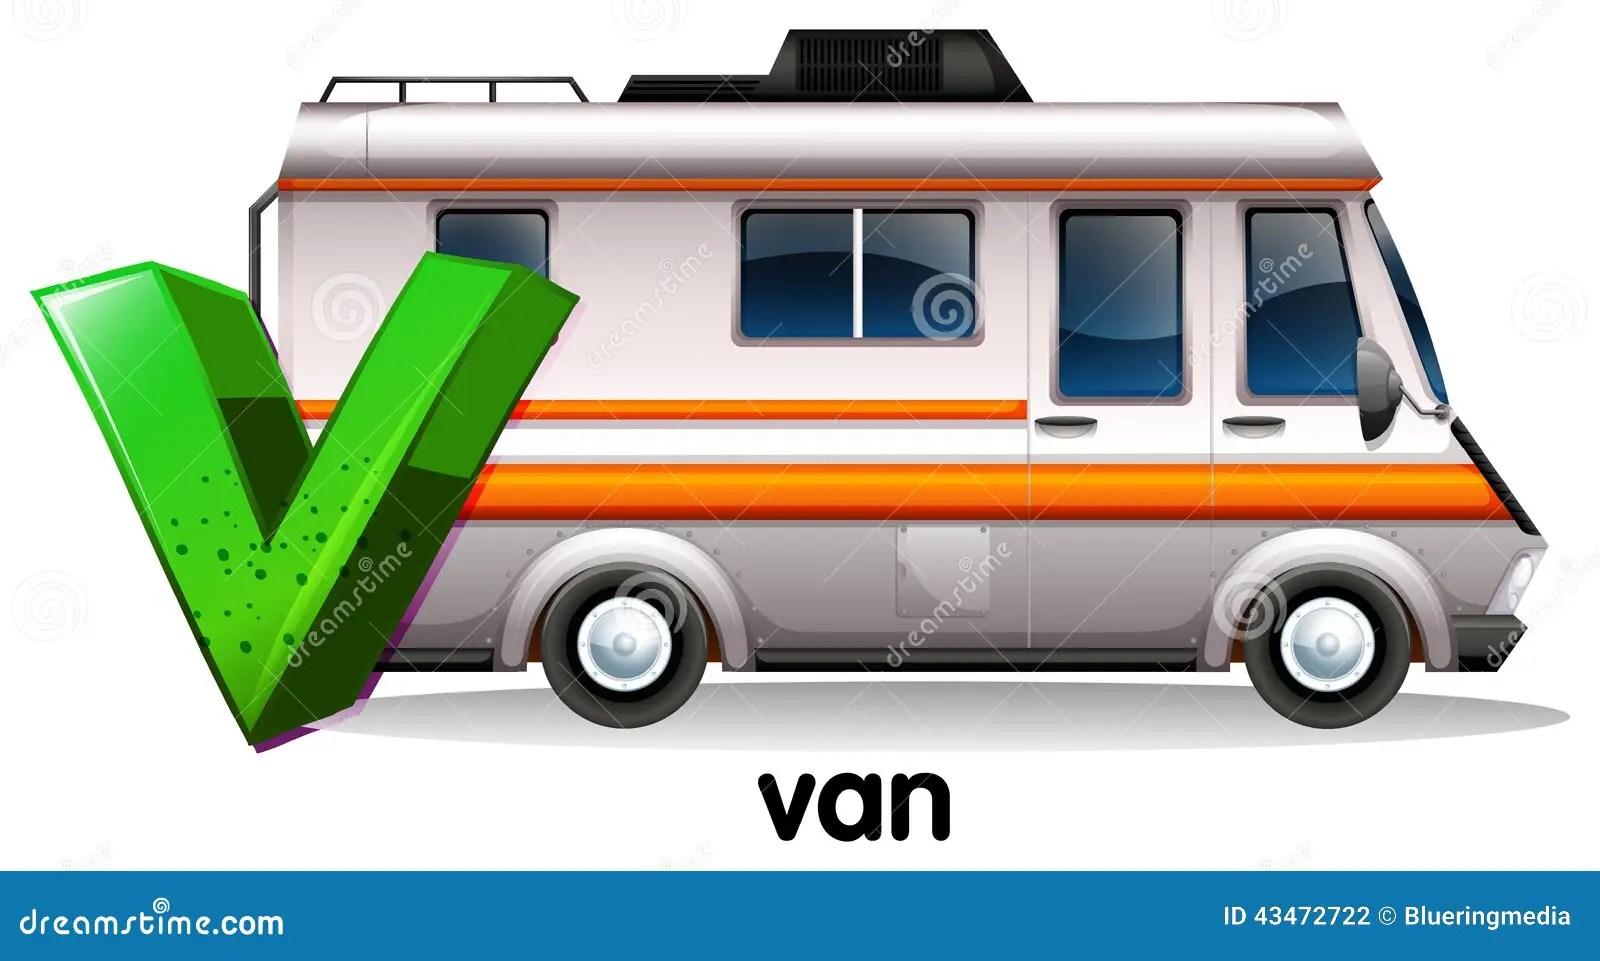 A Letter V For Van Stock Vector